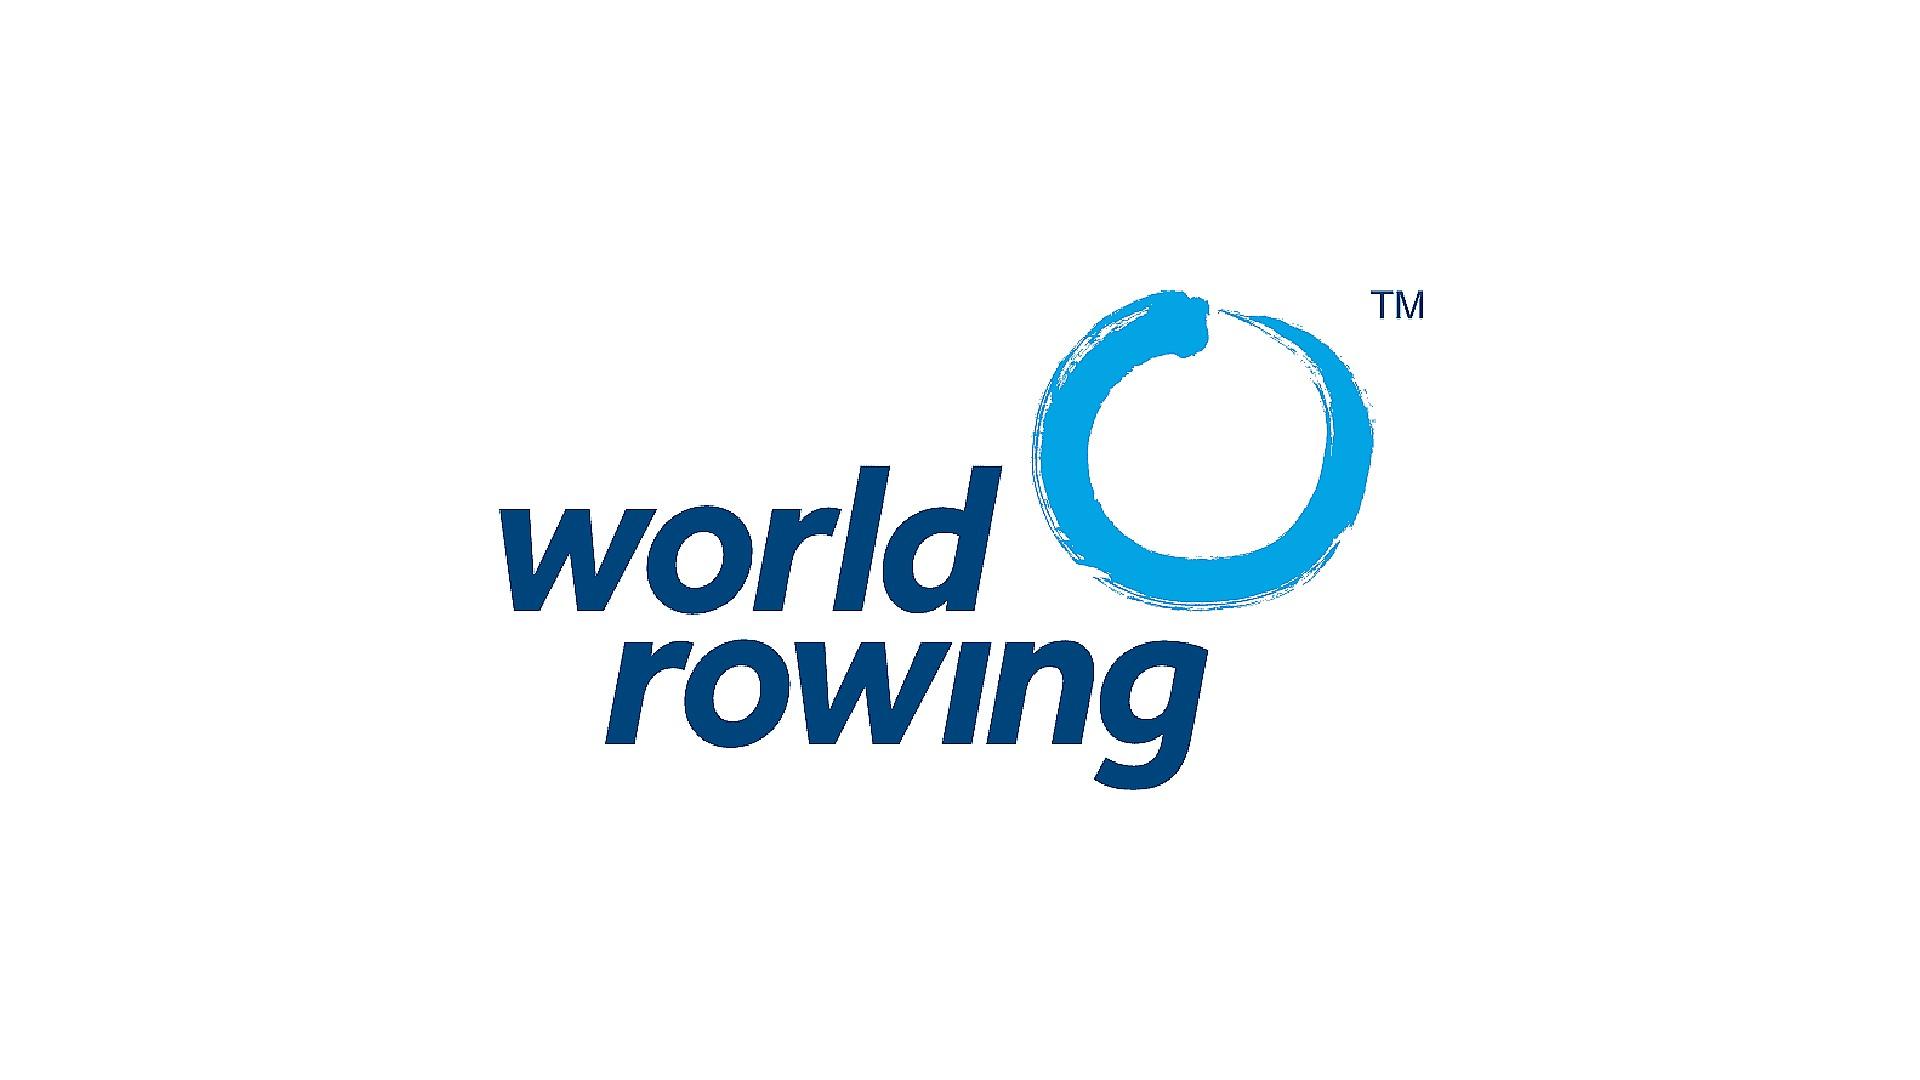 Fédération internatioanle d'aviron – World Rowing